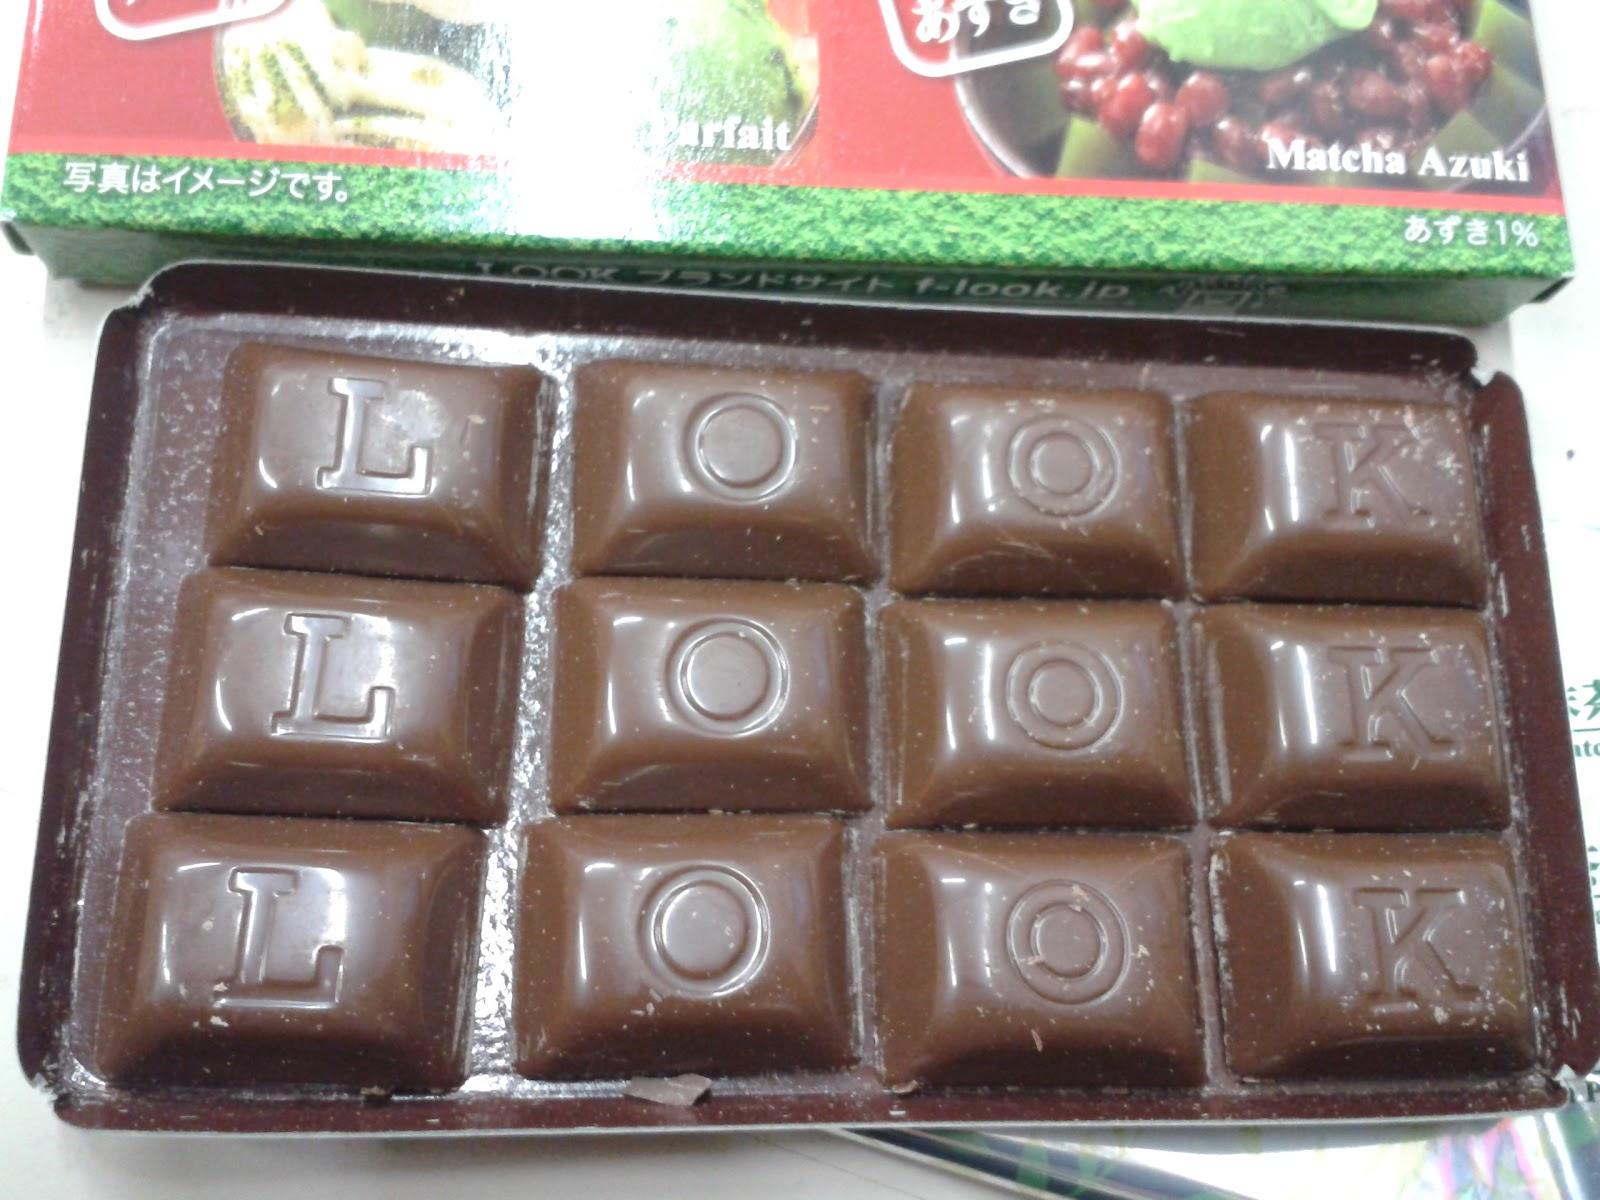 LOOK chocolate: Matcha Parfait and Matcha Azuki | kfclovesyou